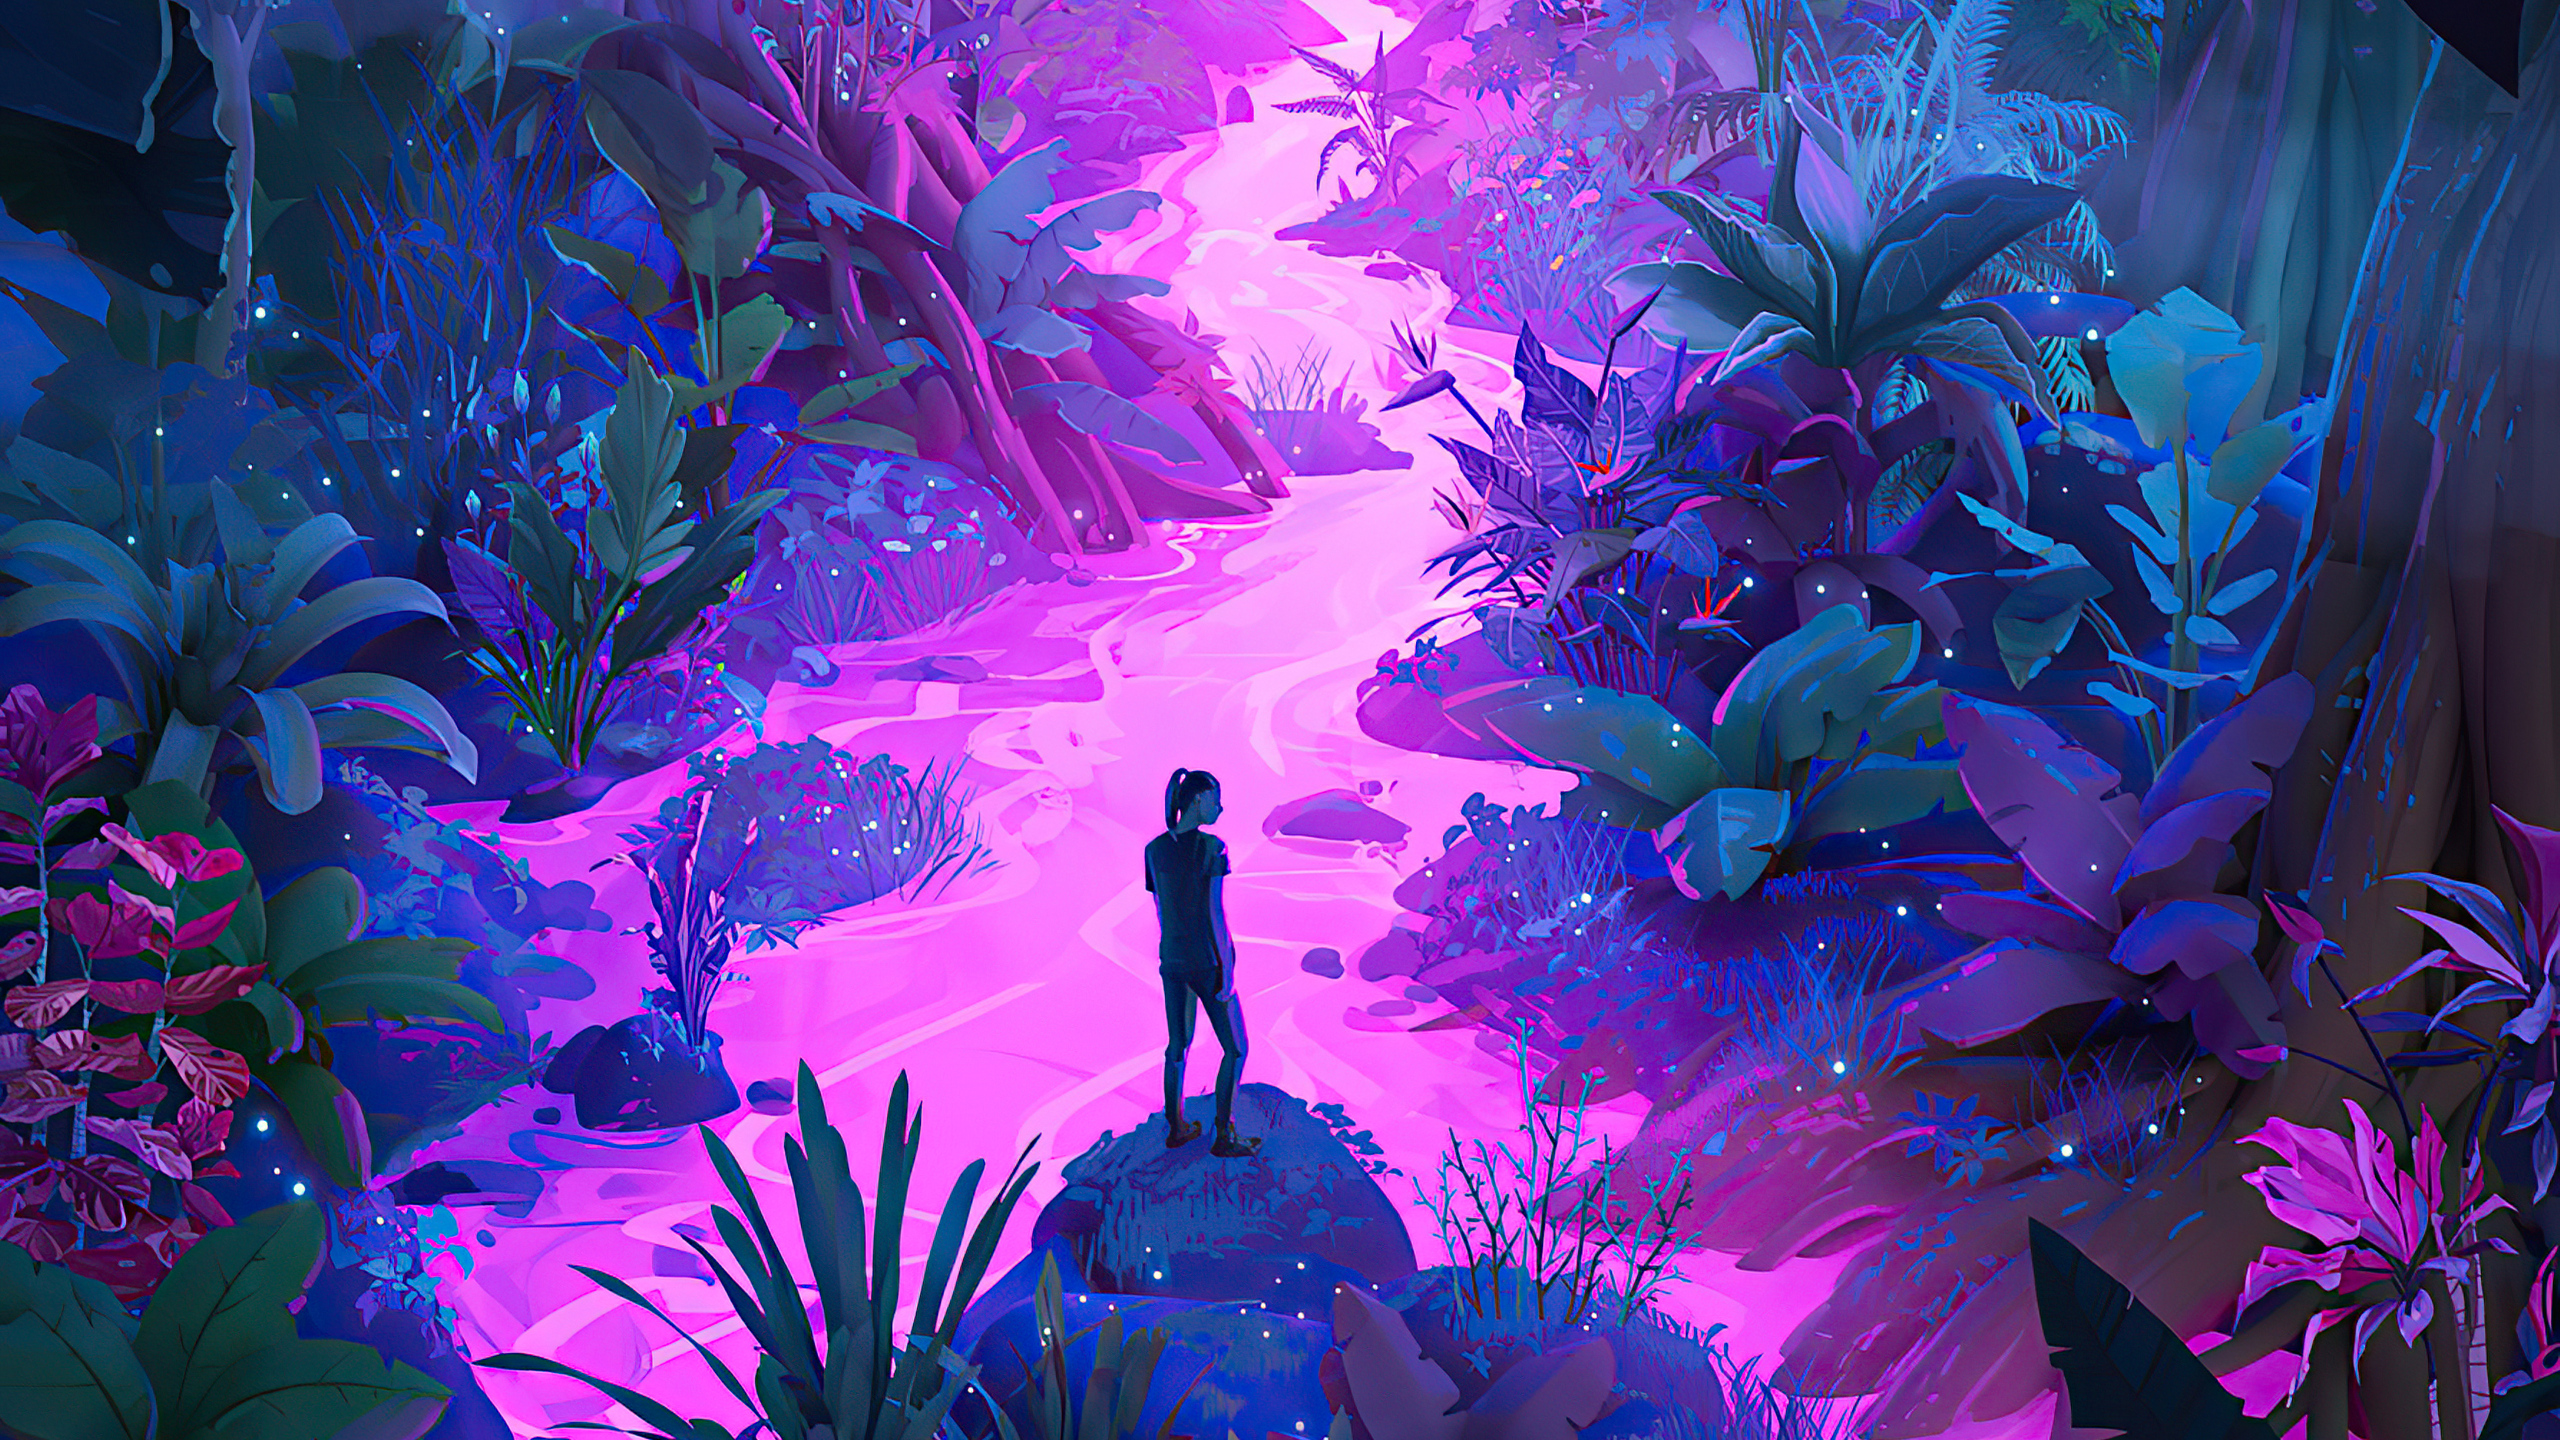 2560x1440 Neon Jungle Art 4k 1440P Resolution HD 4k ...